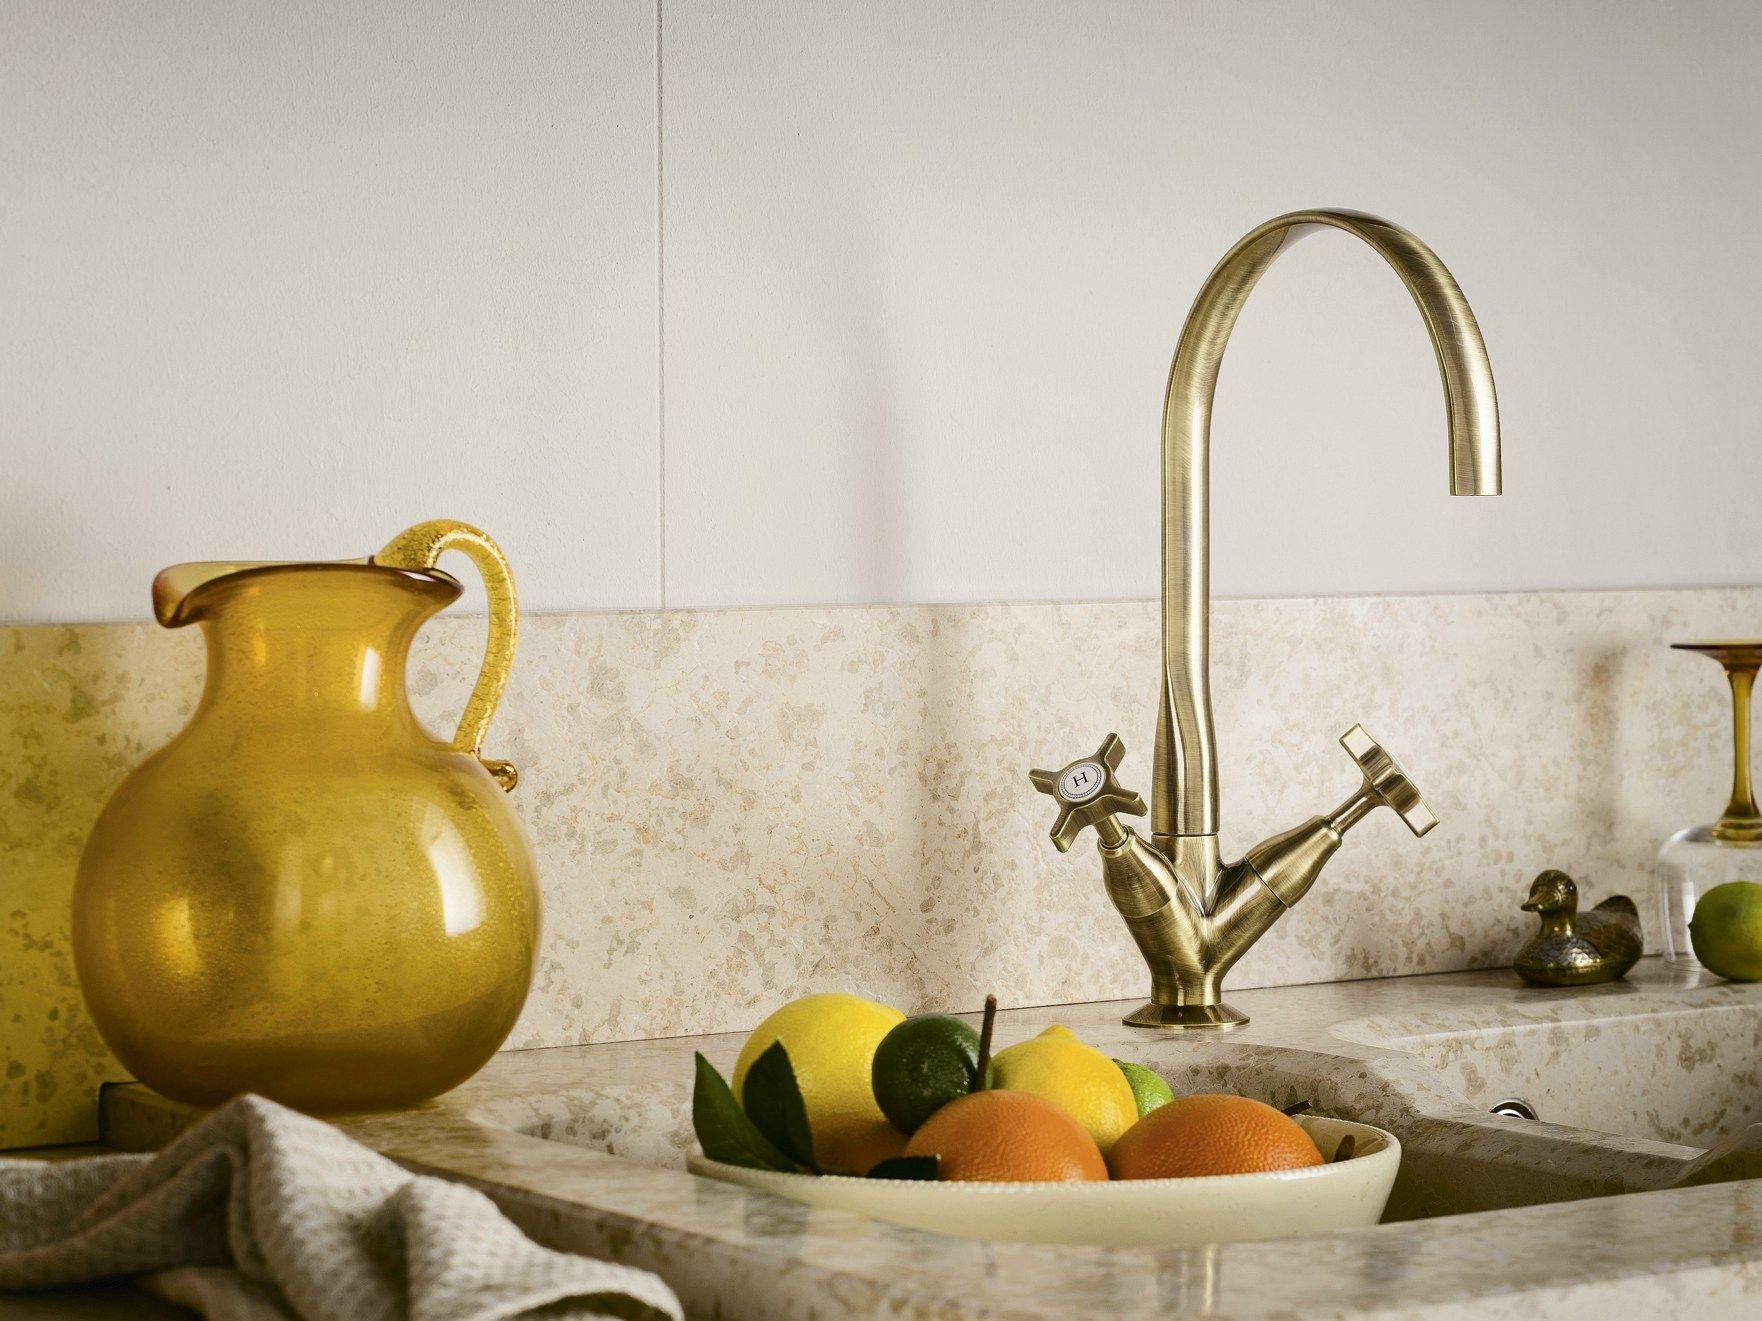 Awesome Nobili Rubinetterie Cucina Ideas - Home Interior Ideas ...